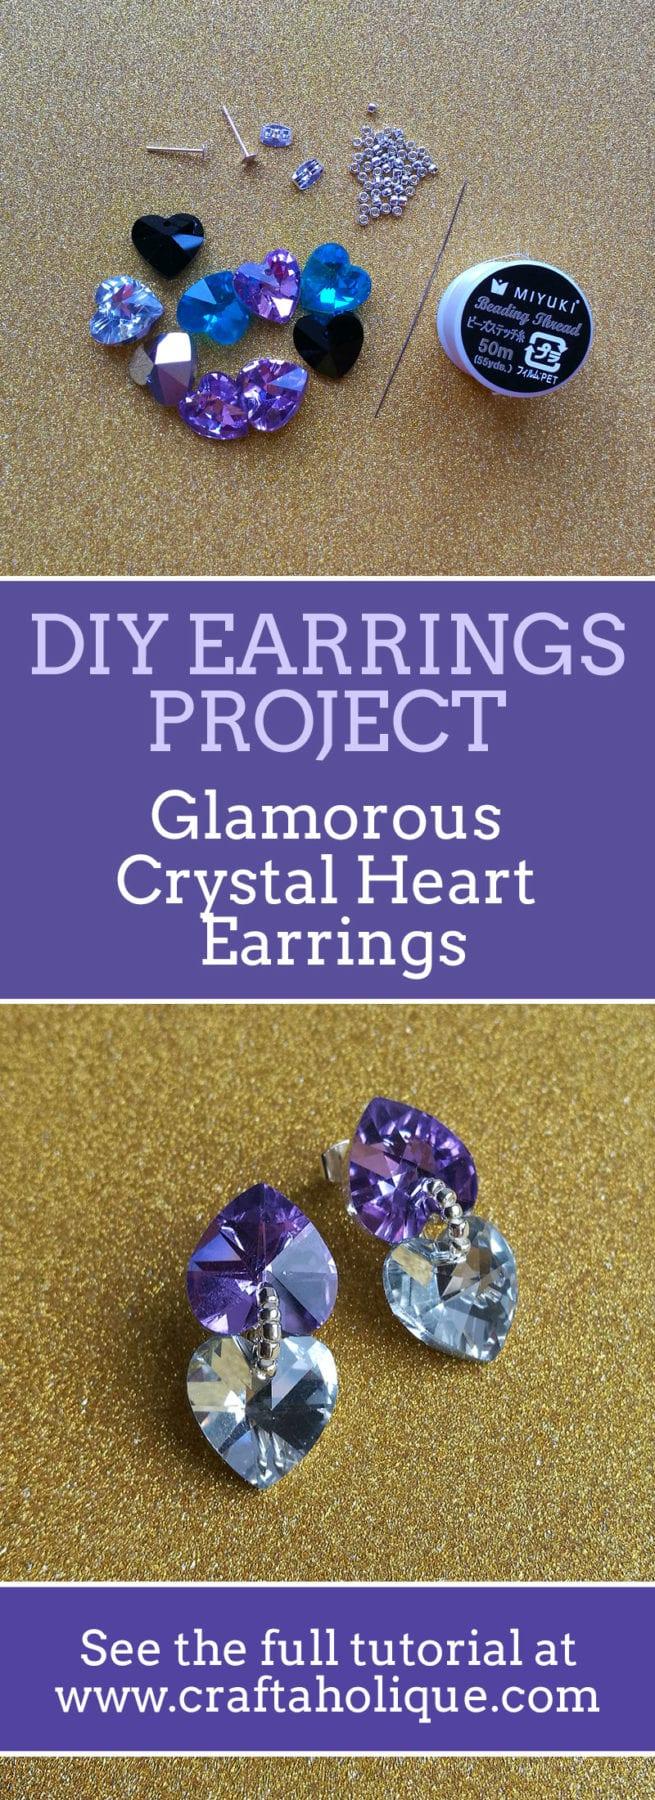 Glamorous Crystal Heart Earrings - Easy Jewellery Making Project